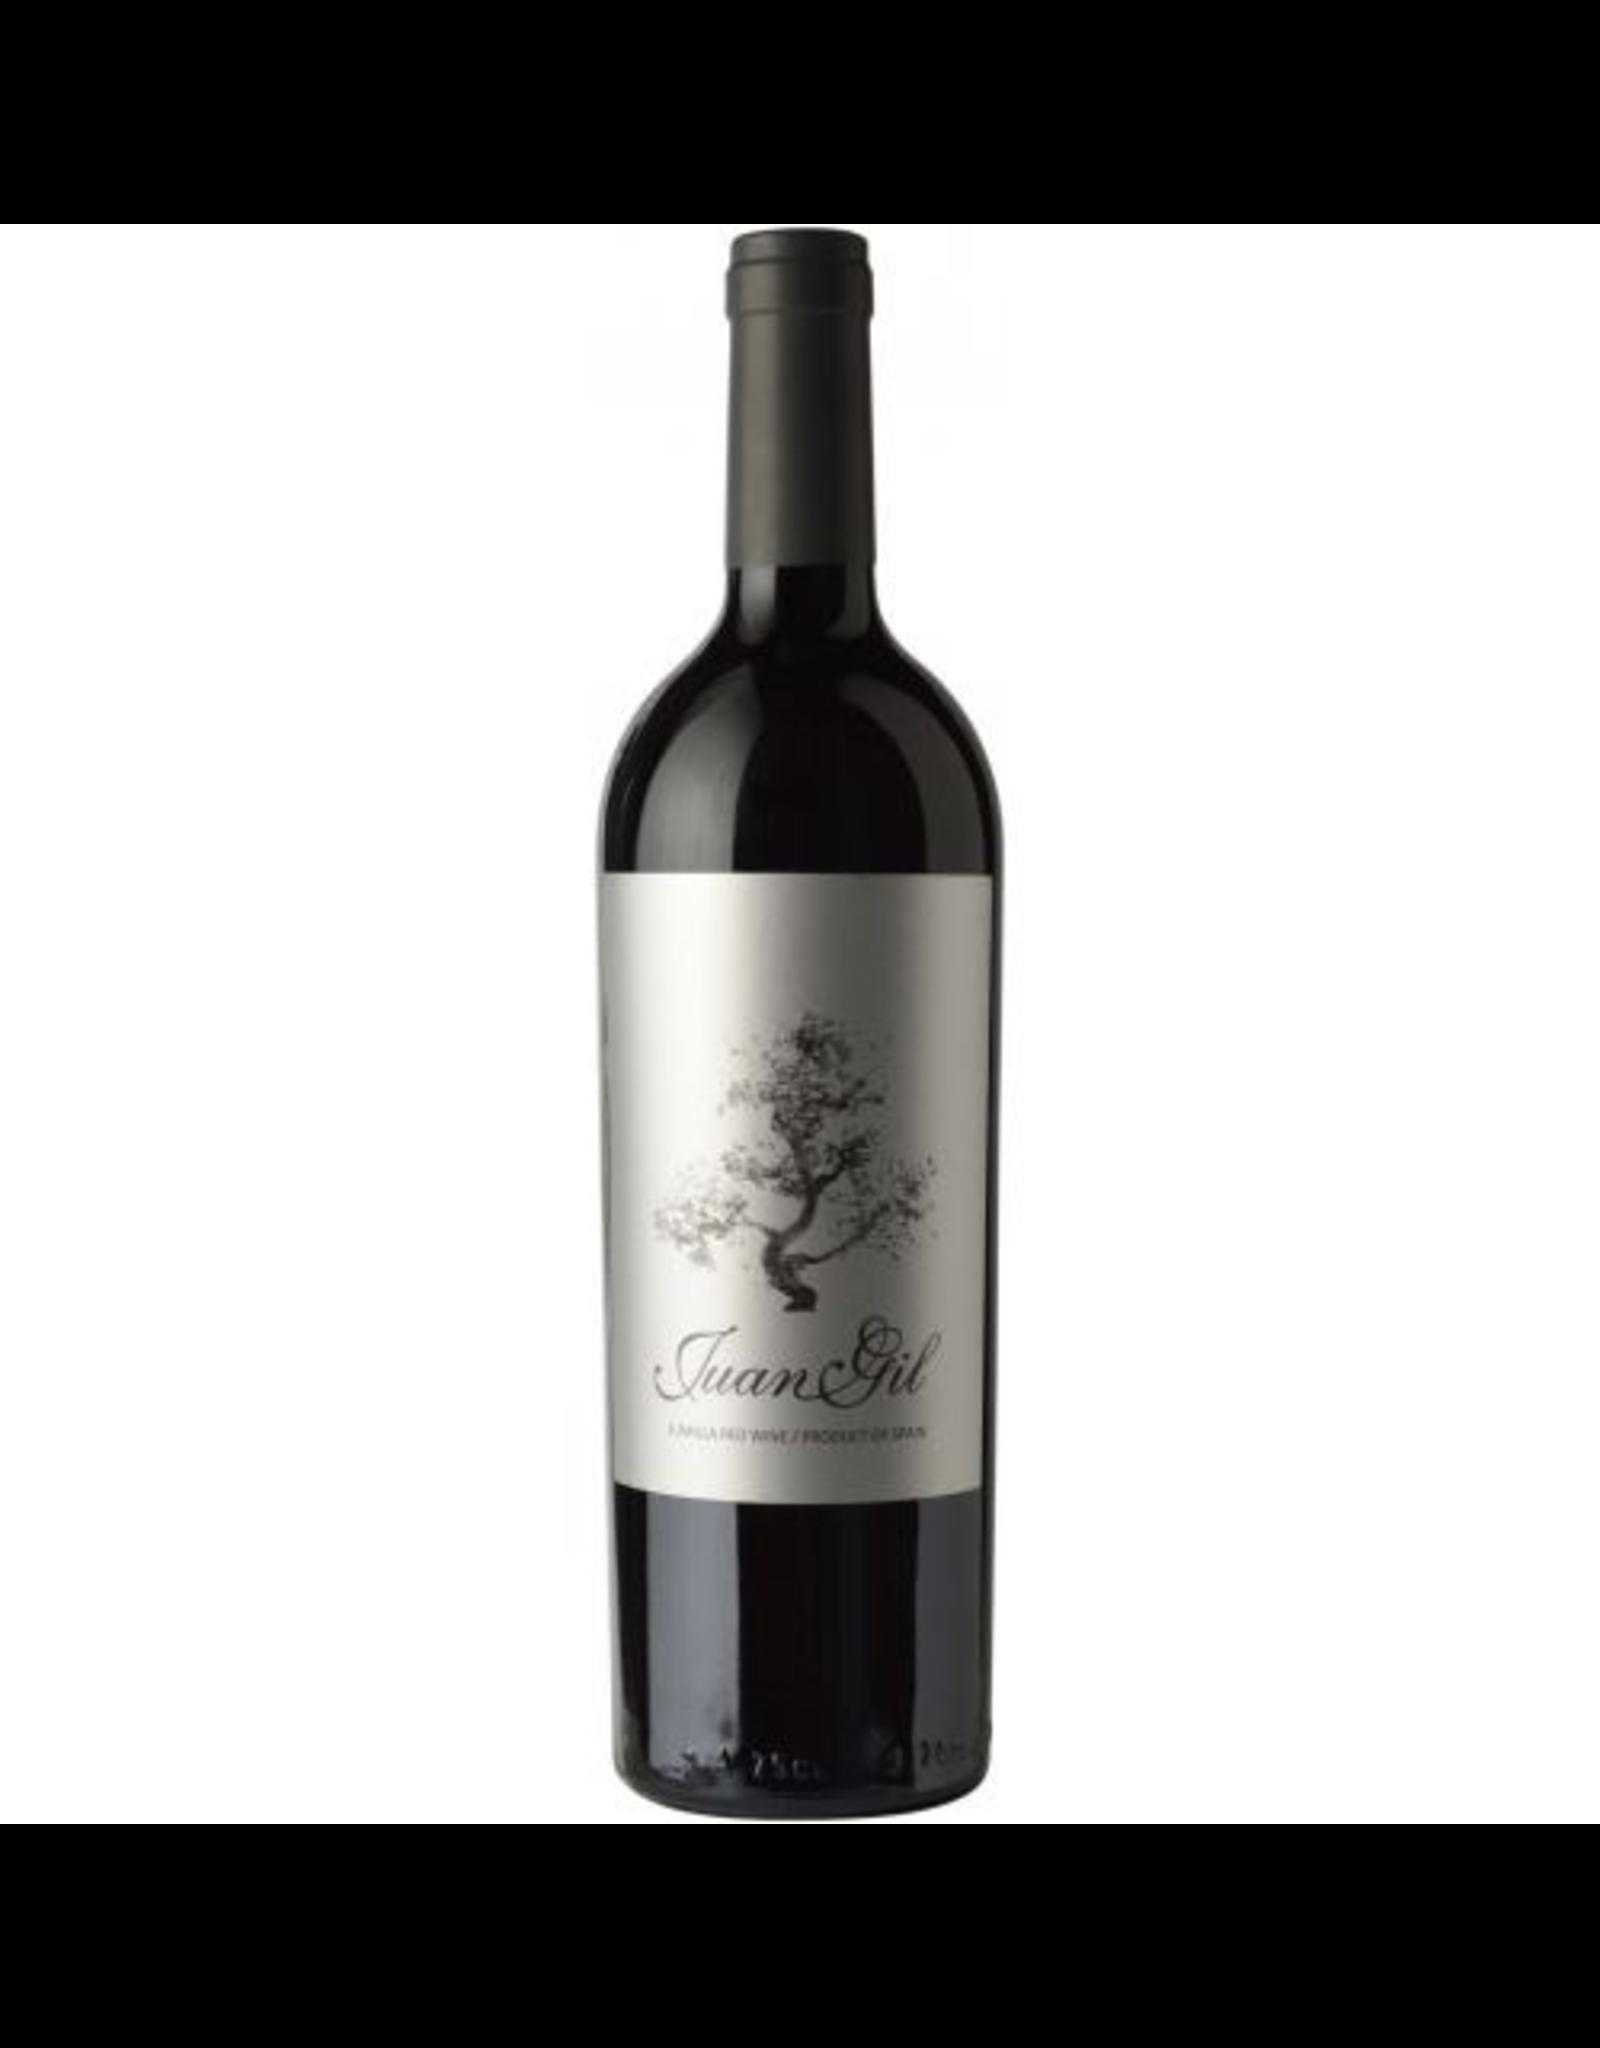 Red Wine 2018, Juan Gil Silver Label, Monastrell, Jumilla, Spain, 15.0% Alc, CTnr, TW91